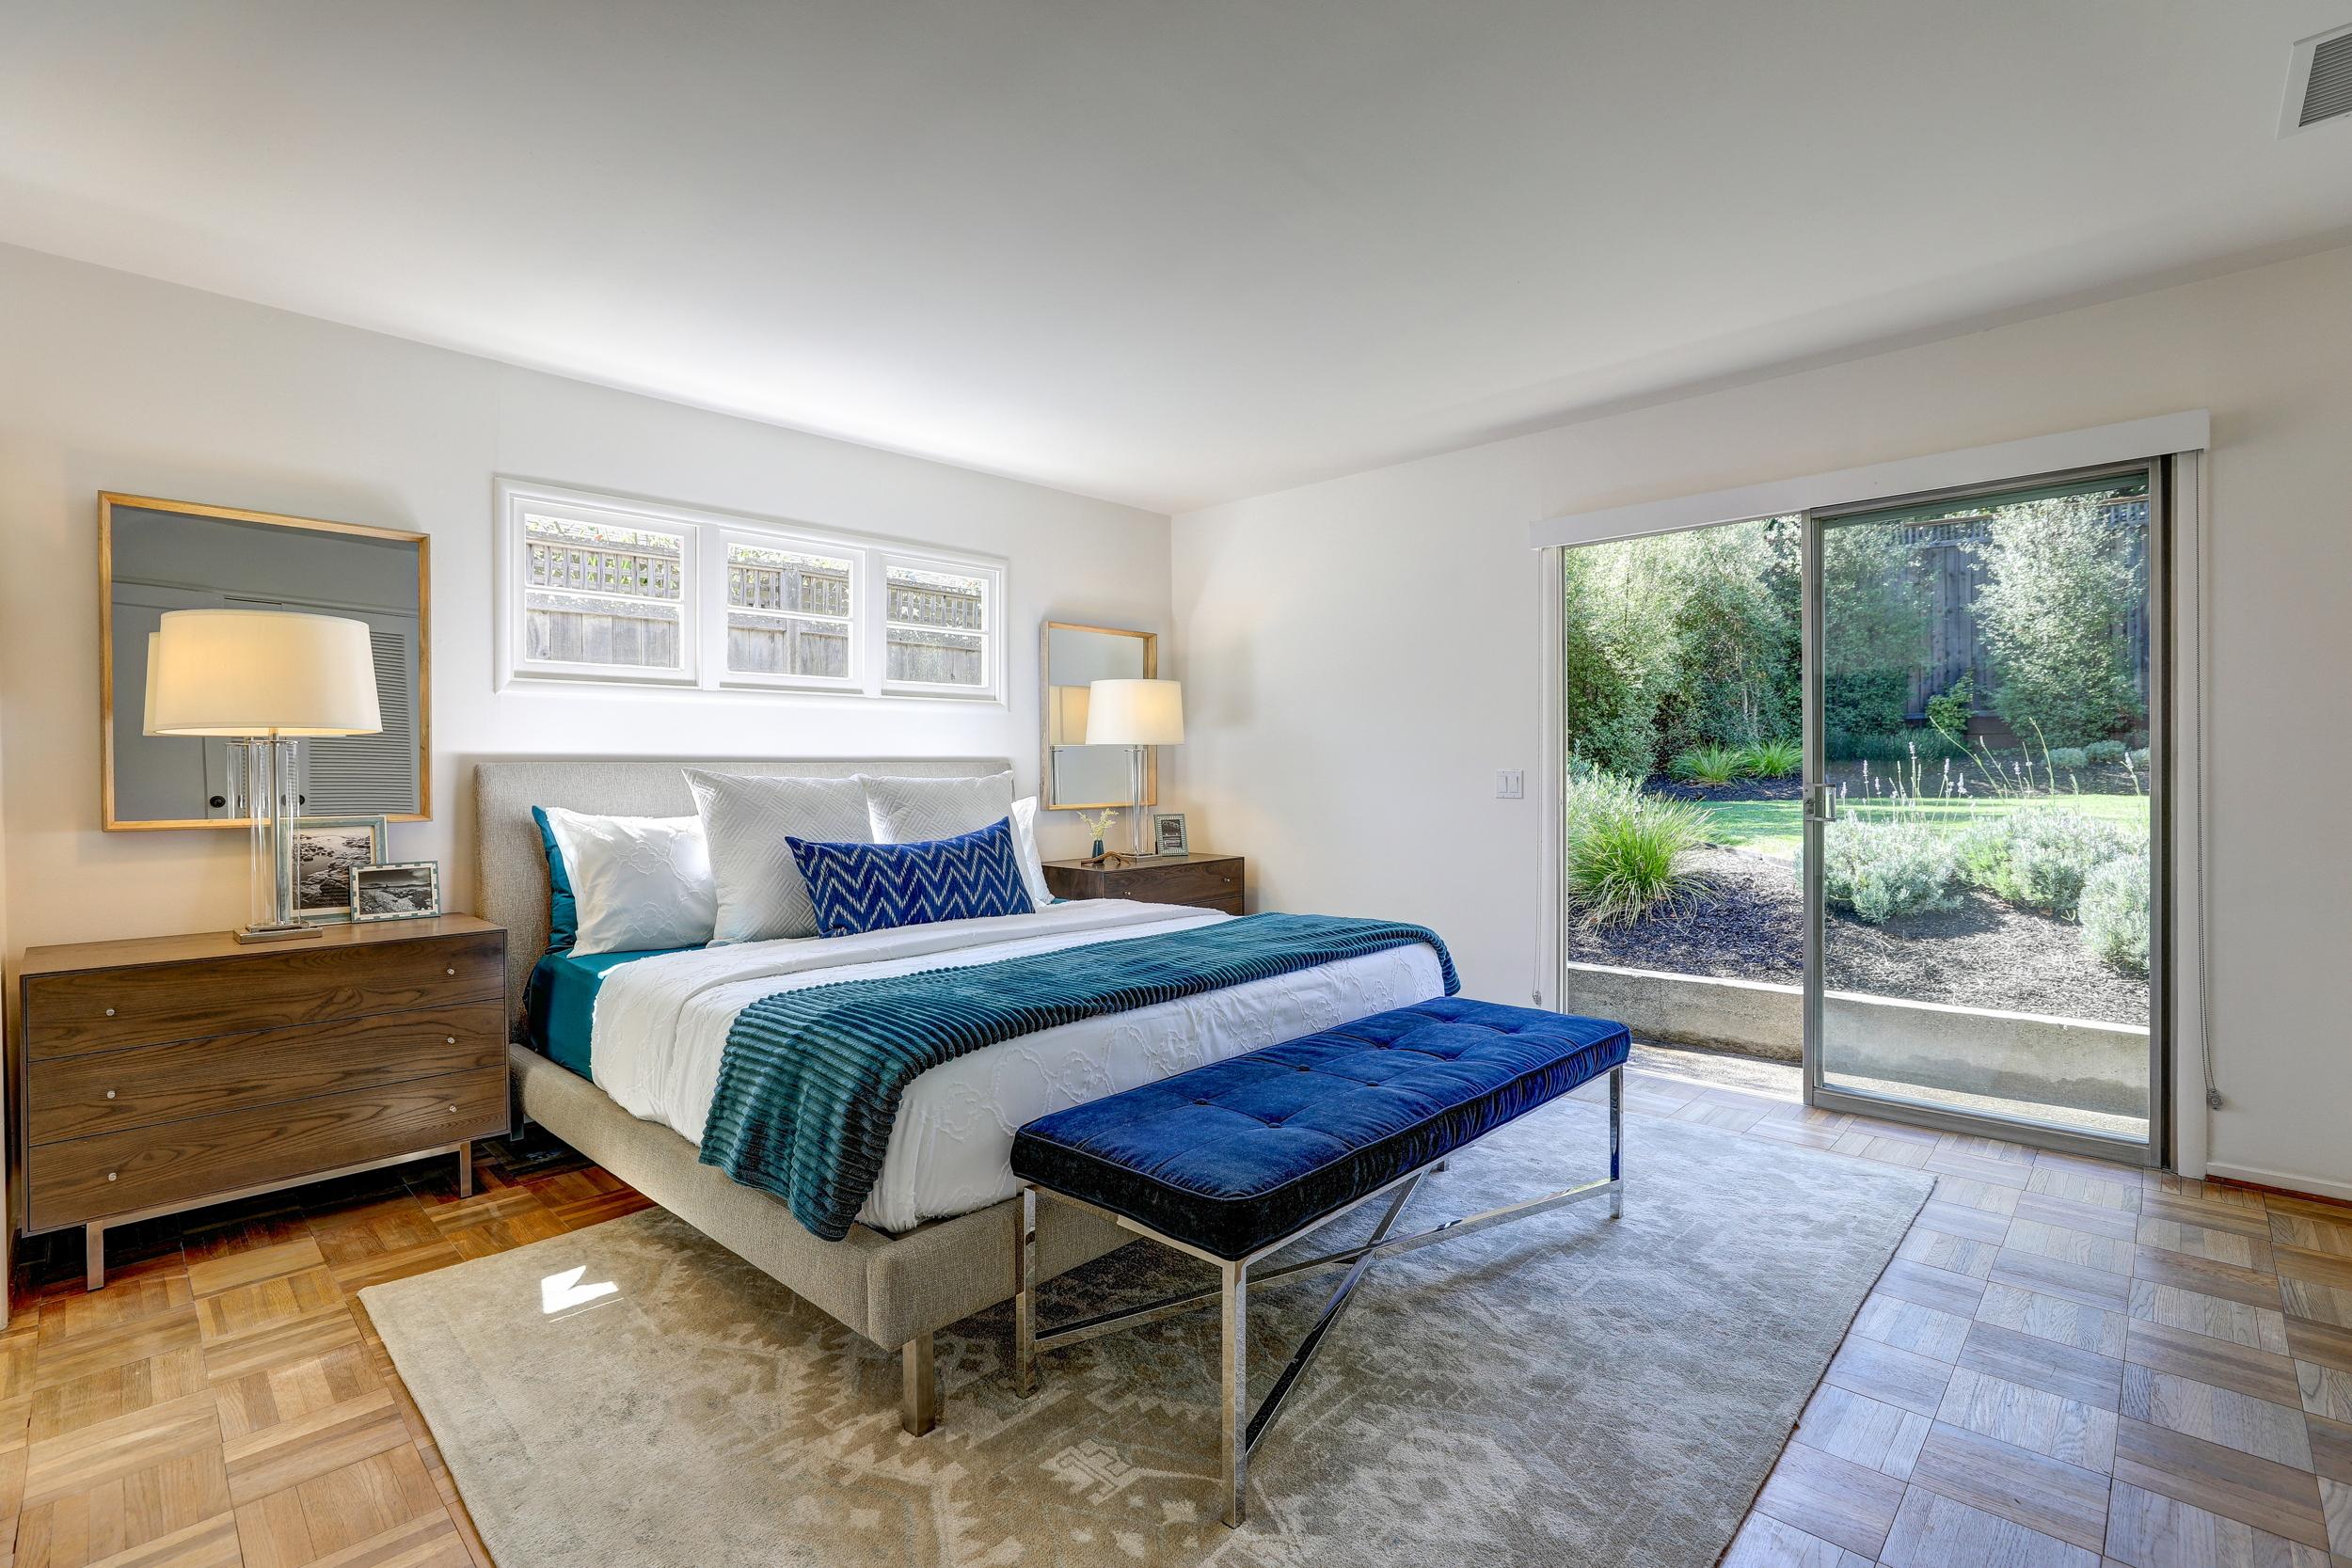 14 McAllister Avenue, Kentfield Top Realtor139 - Own Marin with Compass - Marin County Best Realtor.jpg